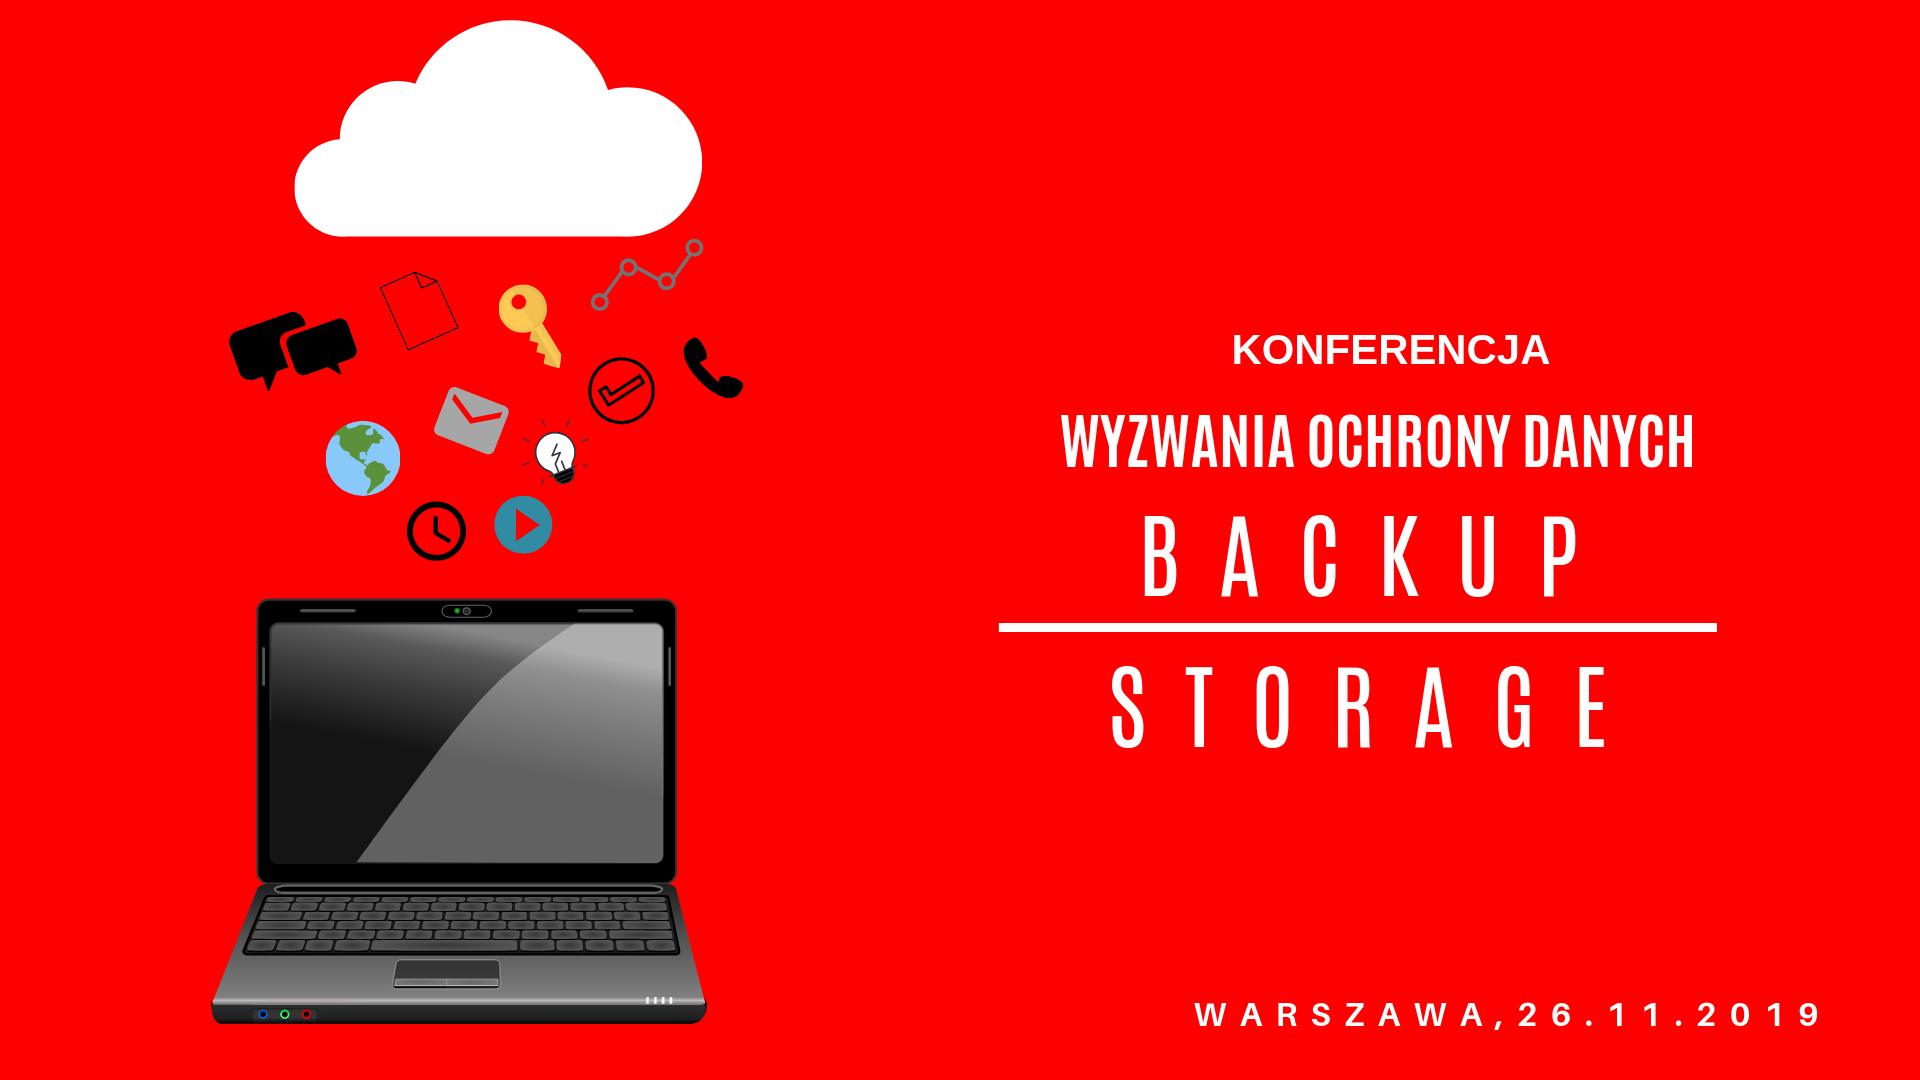 Konferencja – Backup&Storage Systems – portal gdpr.pl – patronatem medialnym